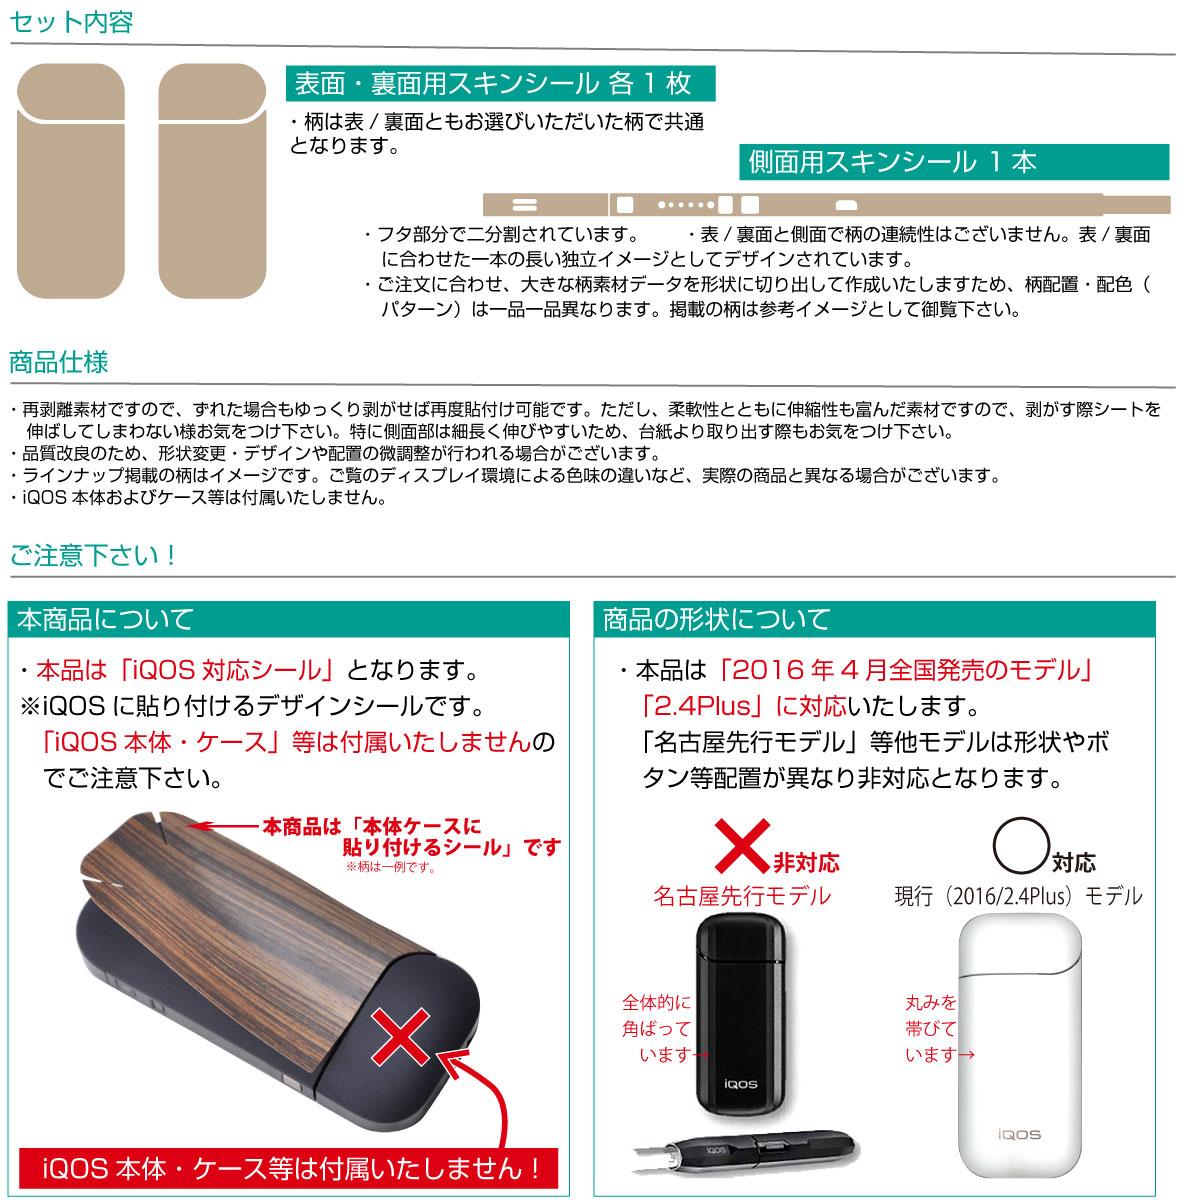 iQOS(アイコス) 専用 デコレーション スキンシール 表面・裏面&側面セット 【 チェック柄 シリーズ 】